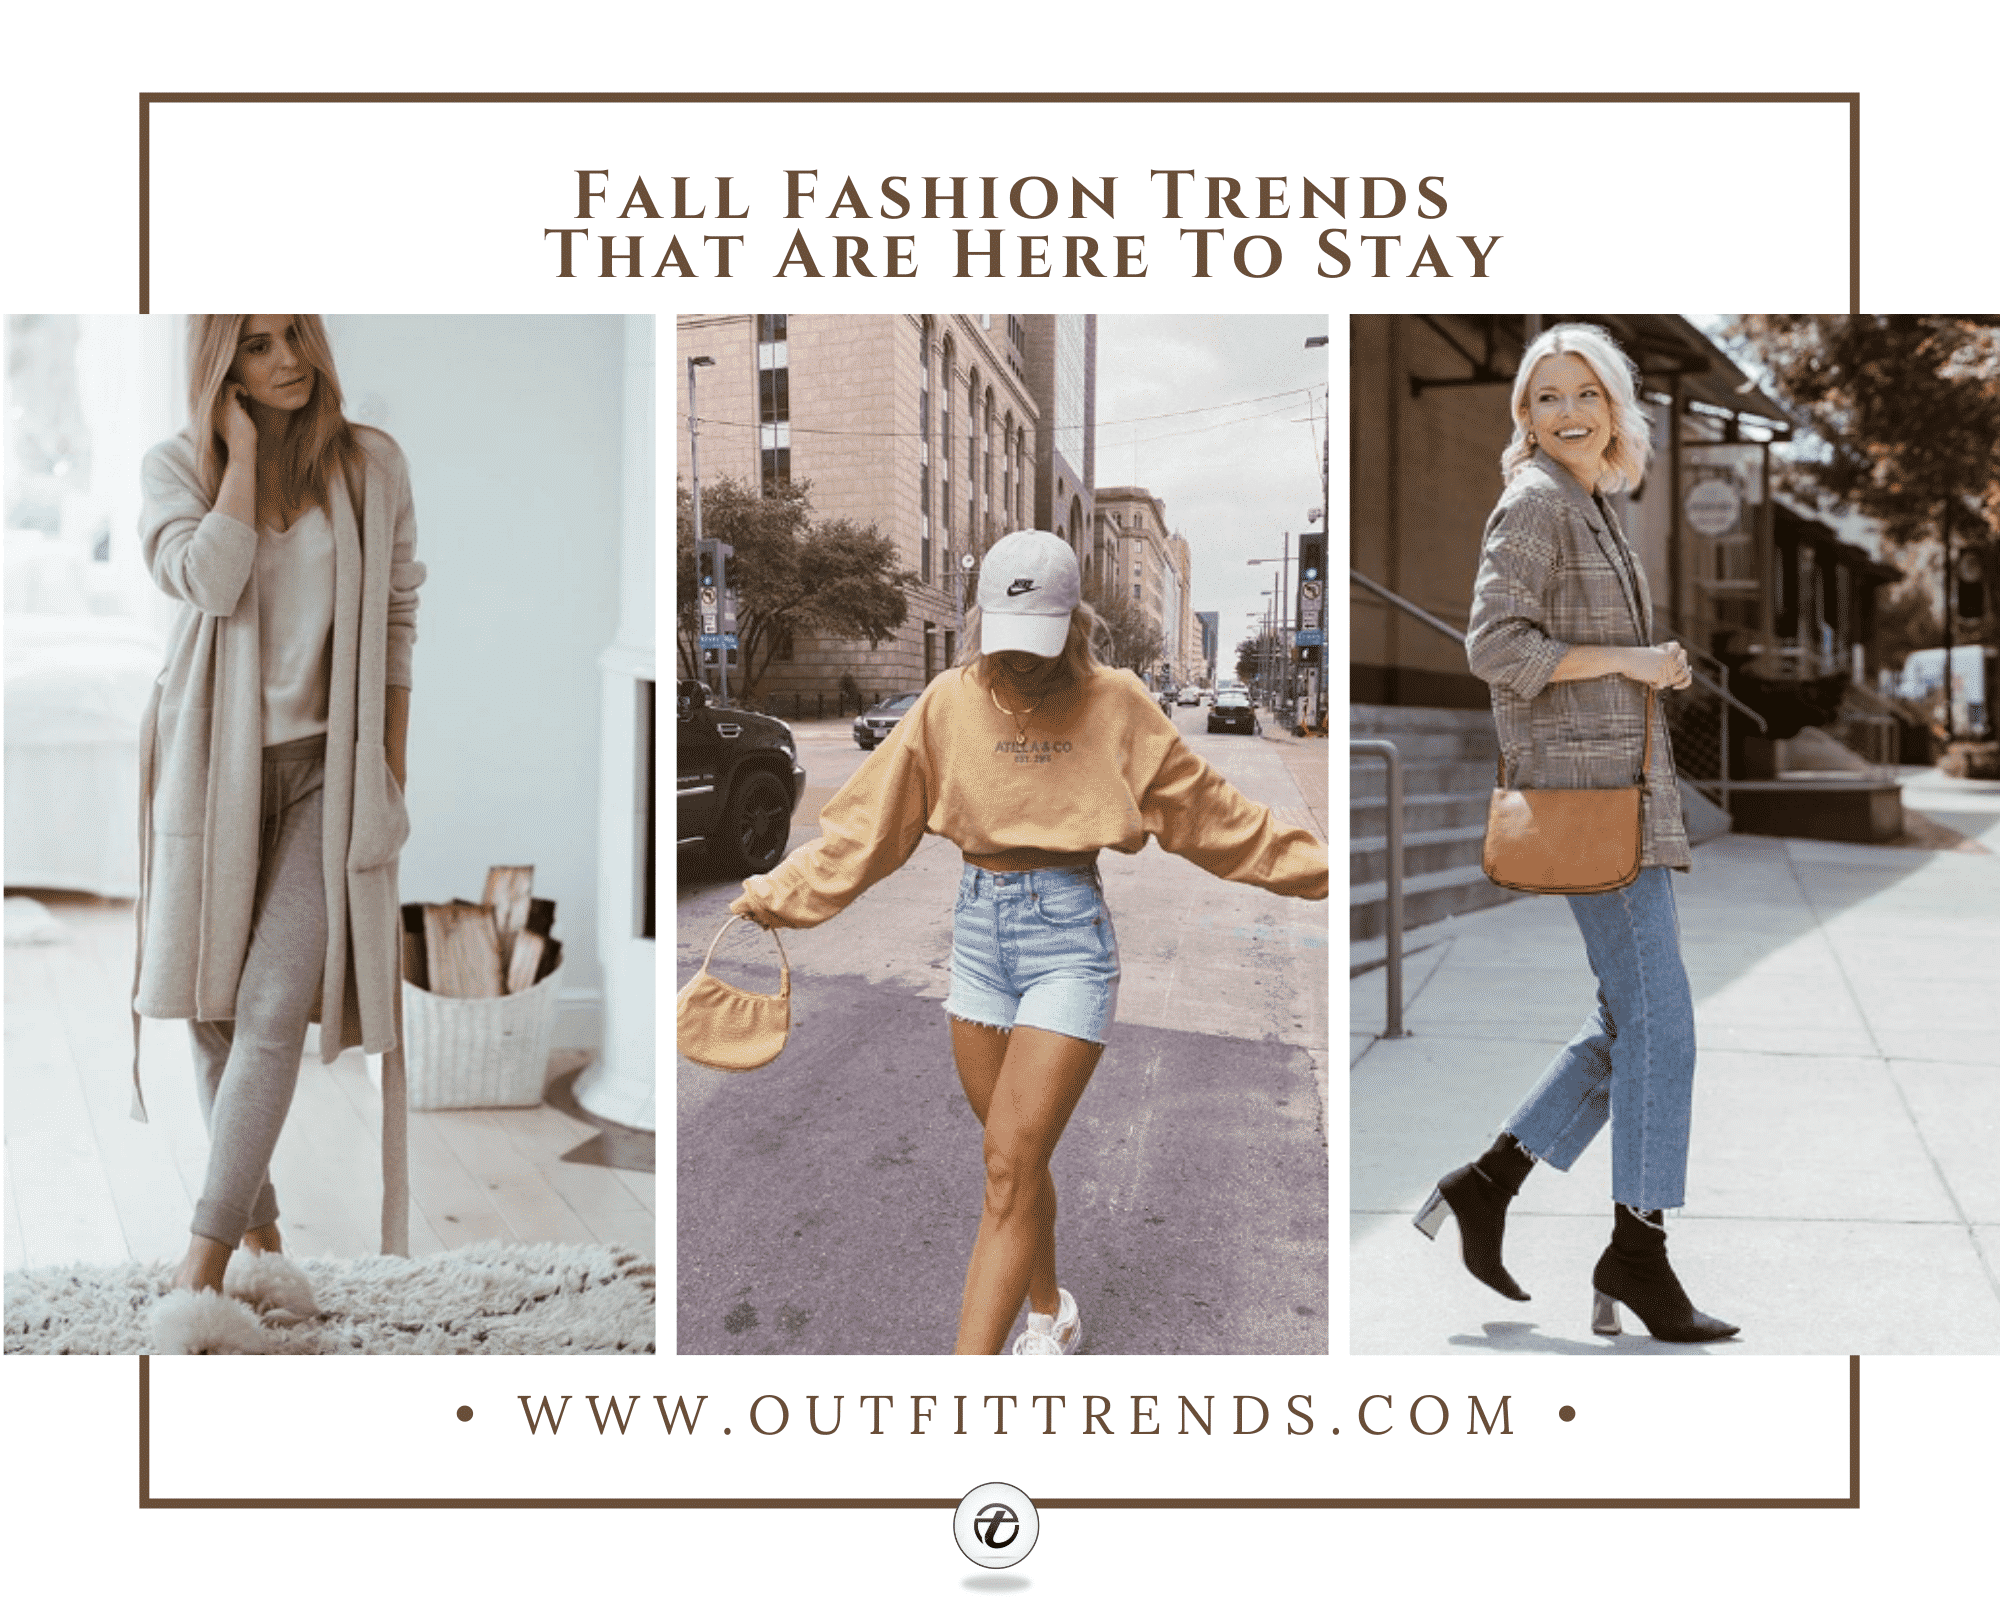 Cute Fall Outfits – 25 Latest Fall Fashion Ideas for Girls